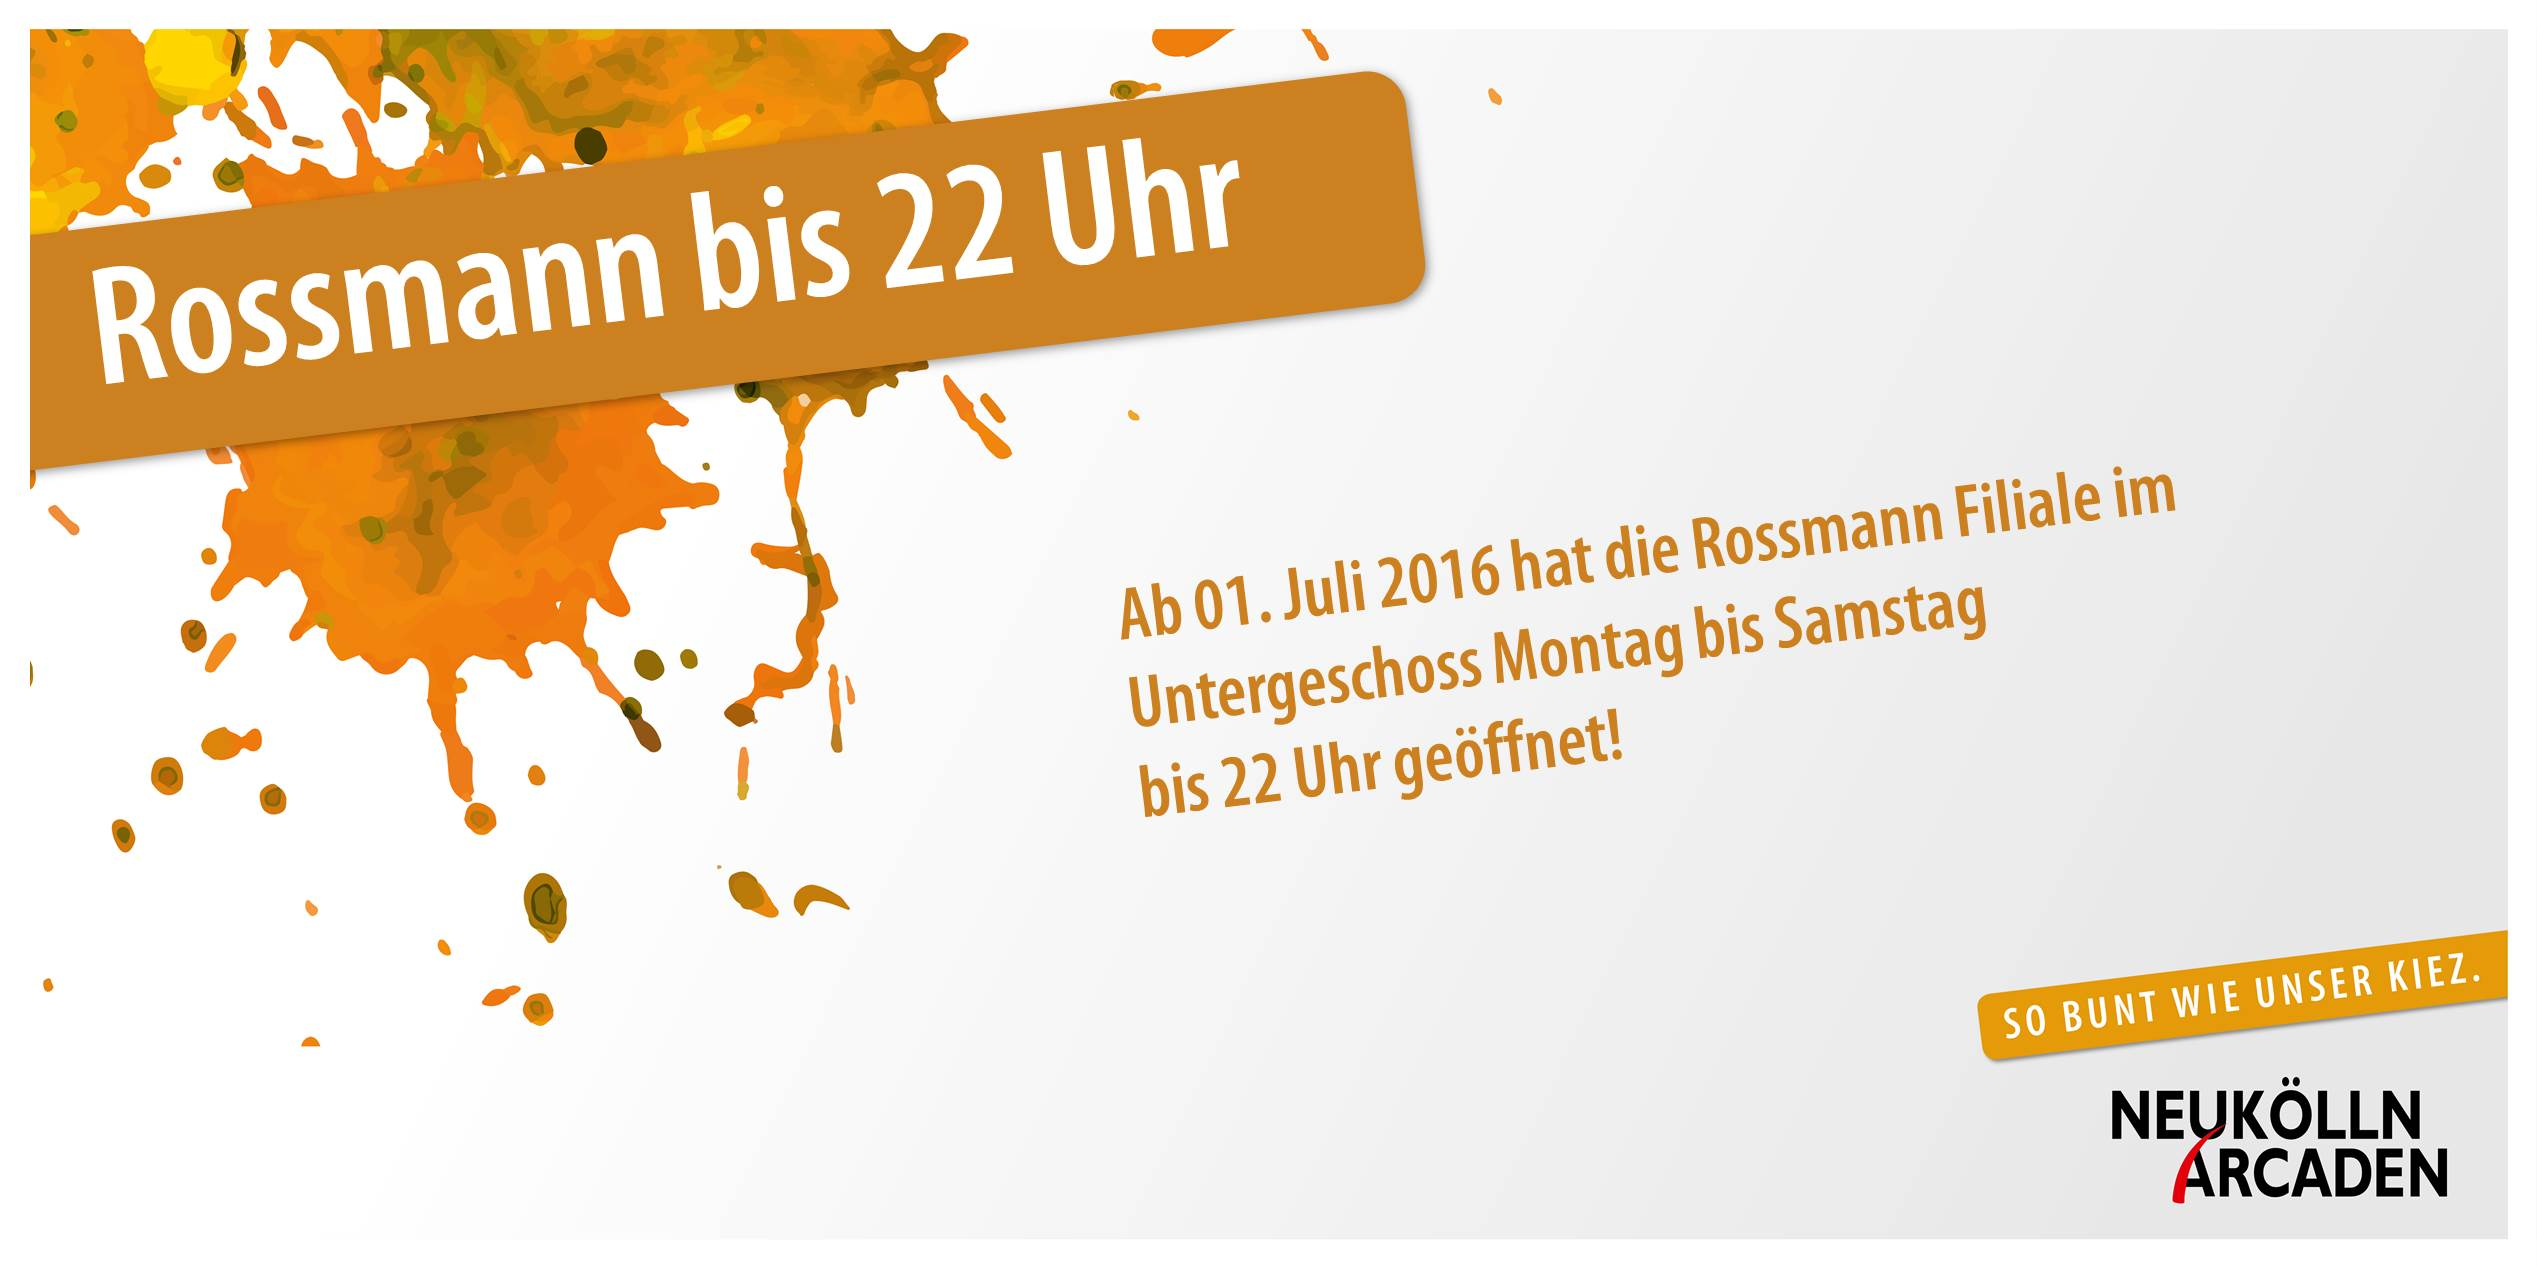 Rossmann ab dem 1. Juli bis 22 Uhr geöffnet